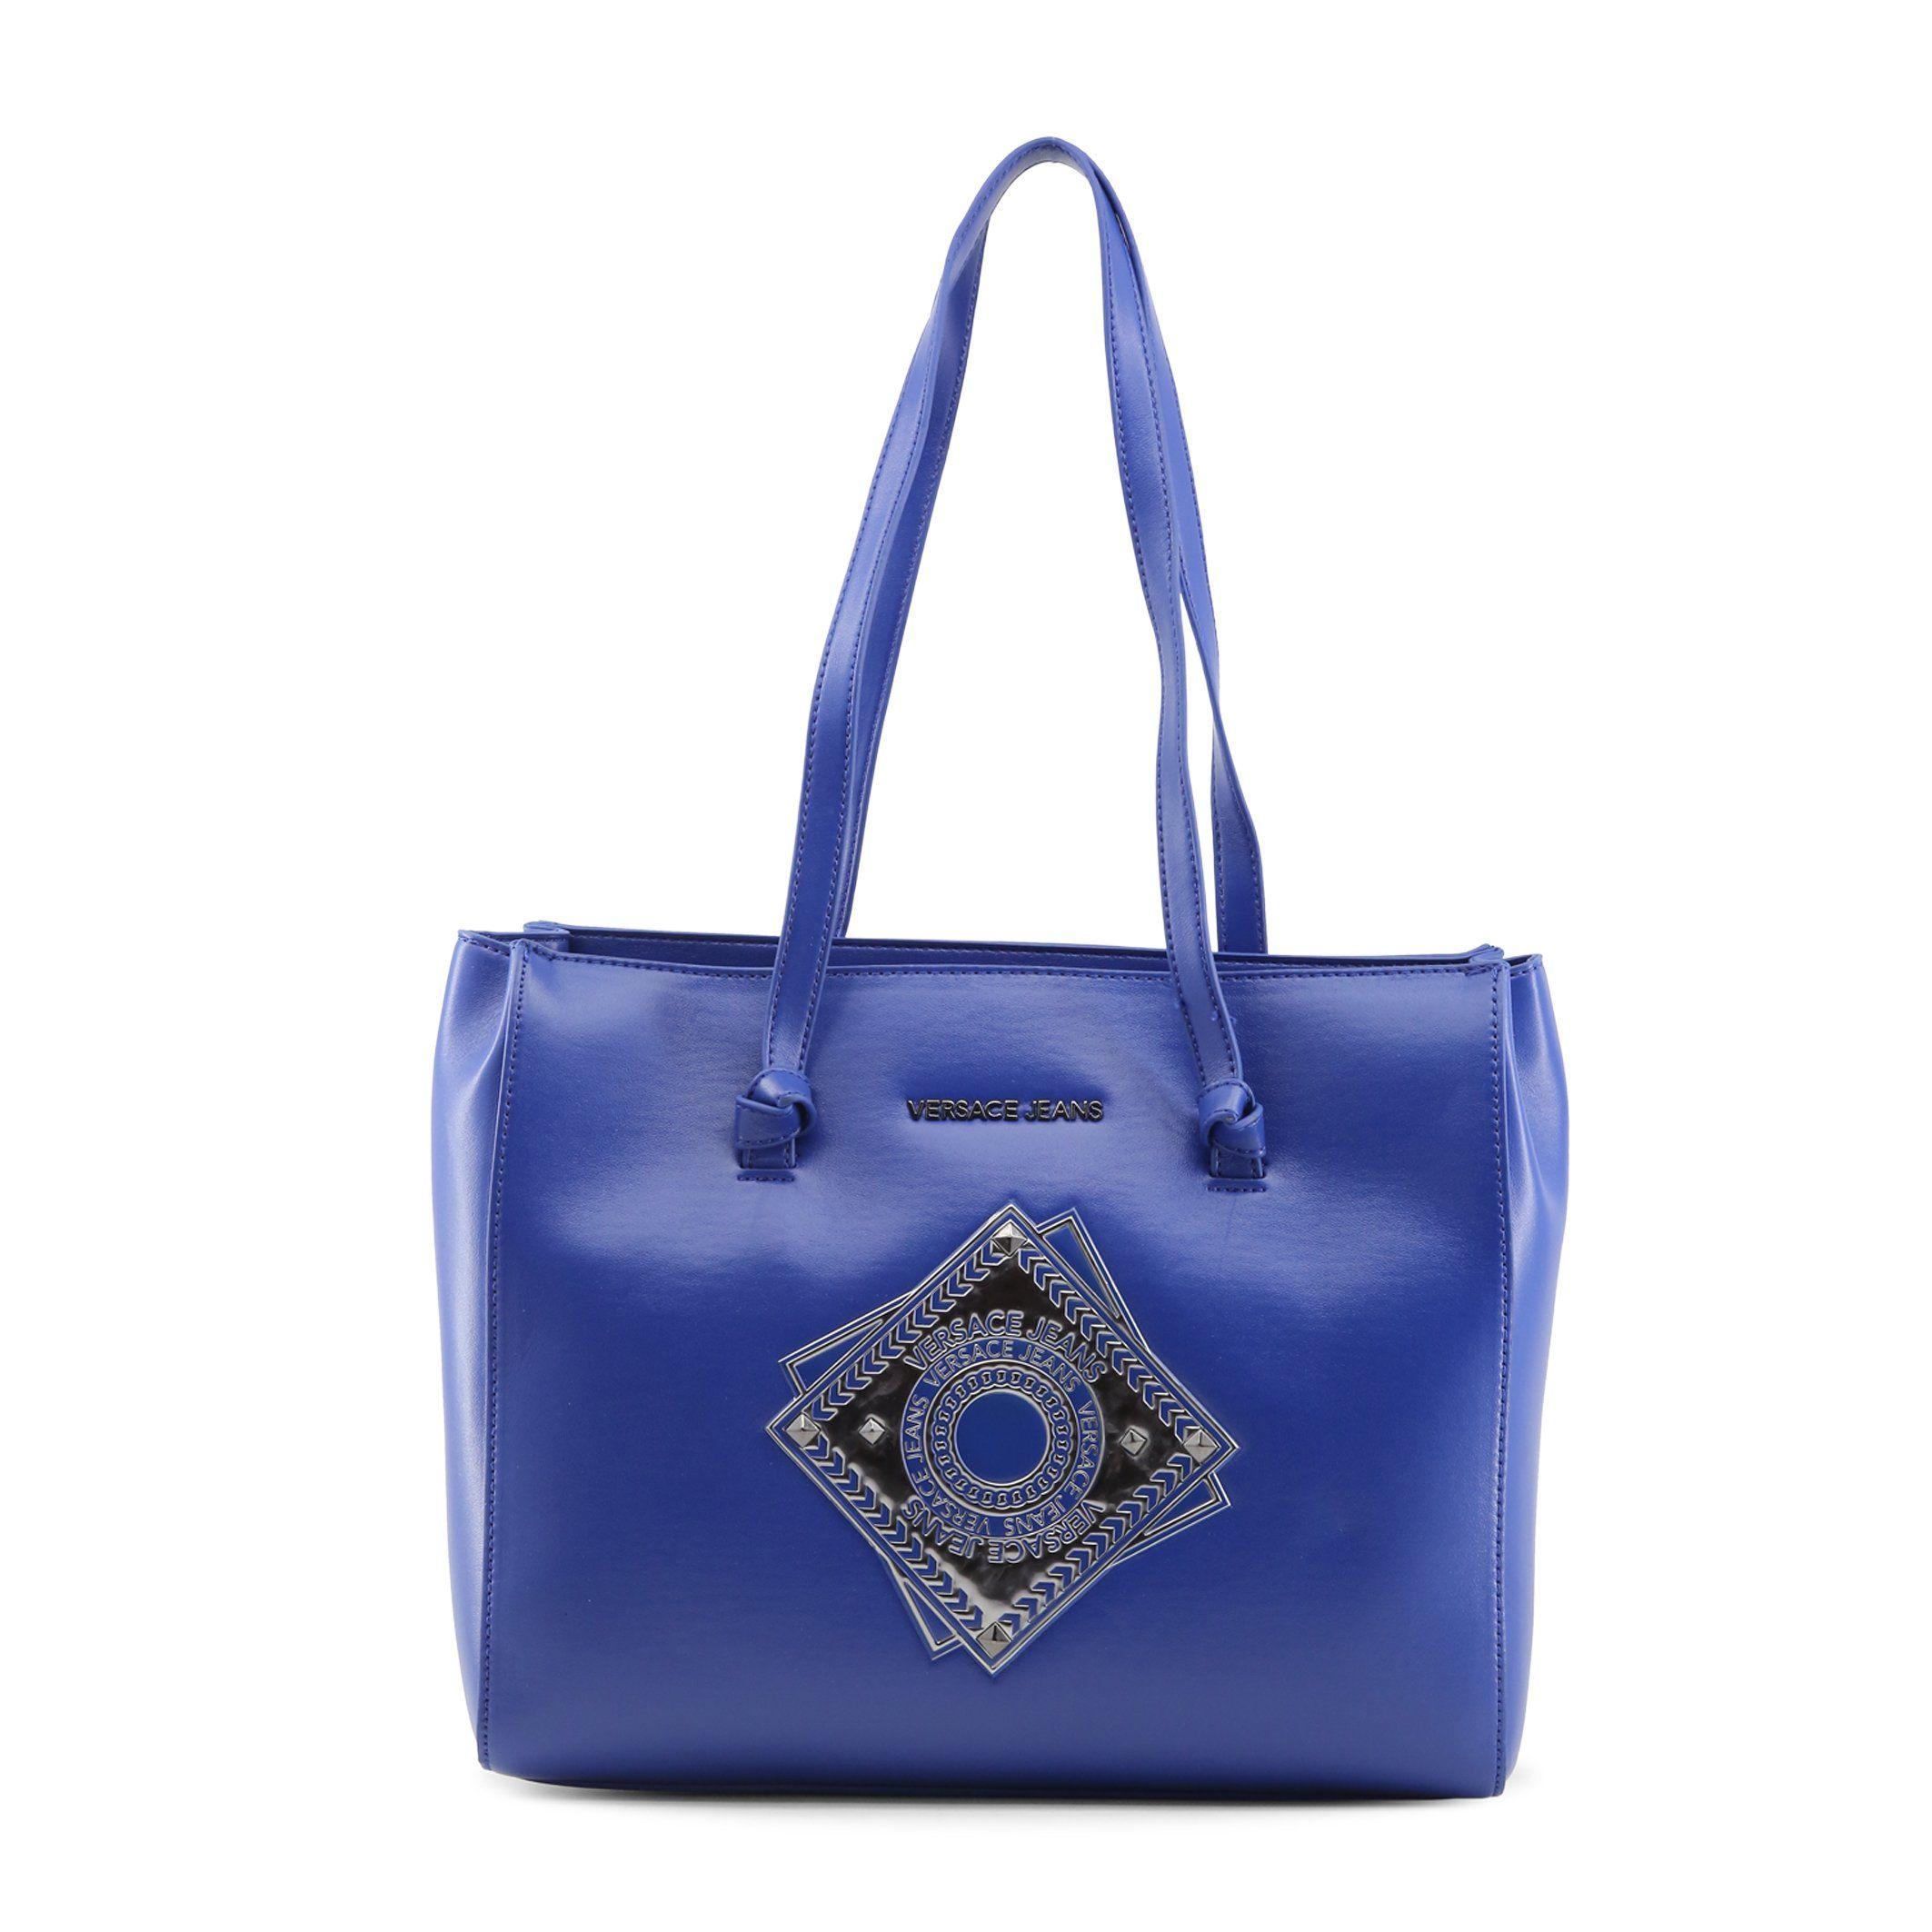 1c4ca89f2f Versace Jeans E1VQBBA7_75425. Versace Jeans E1VQBBA7_75425 Blue Shoulder  Bags ...